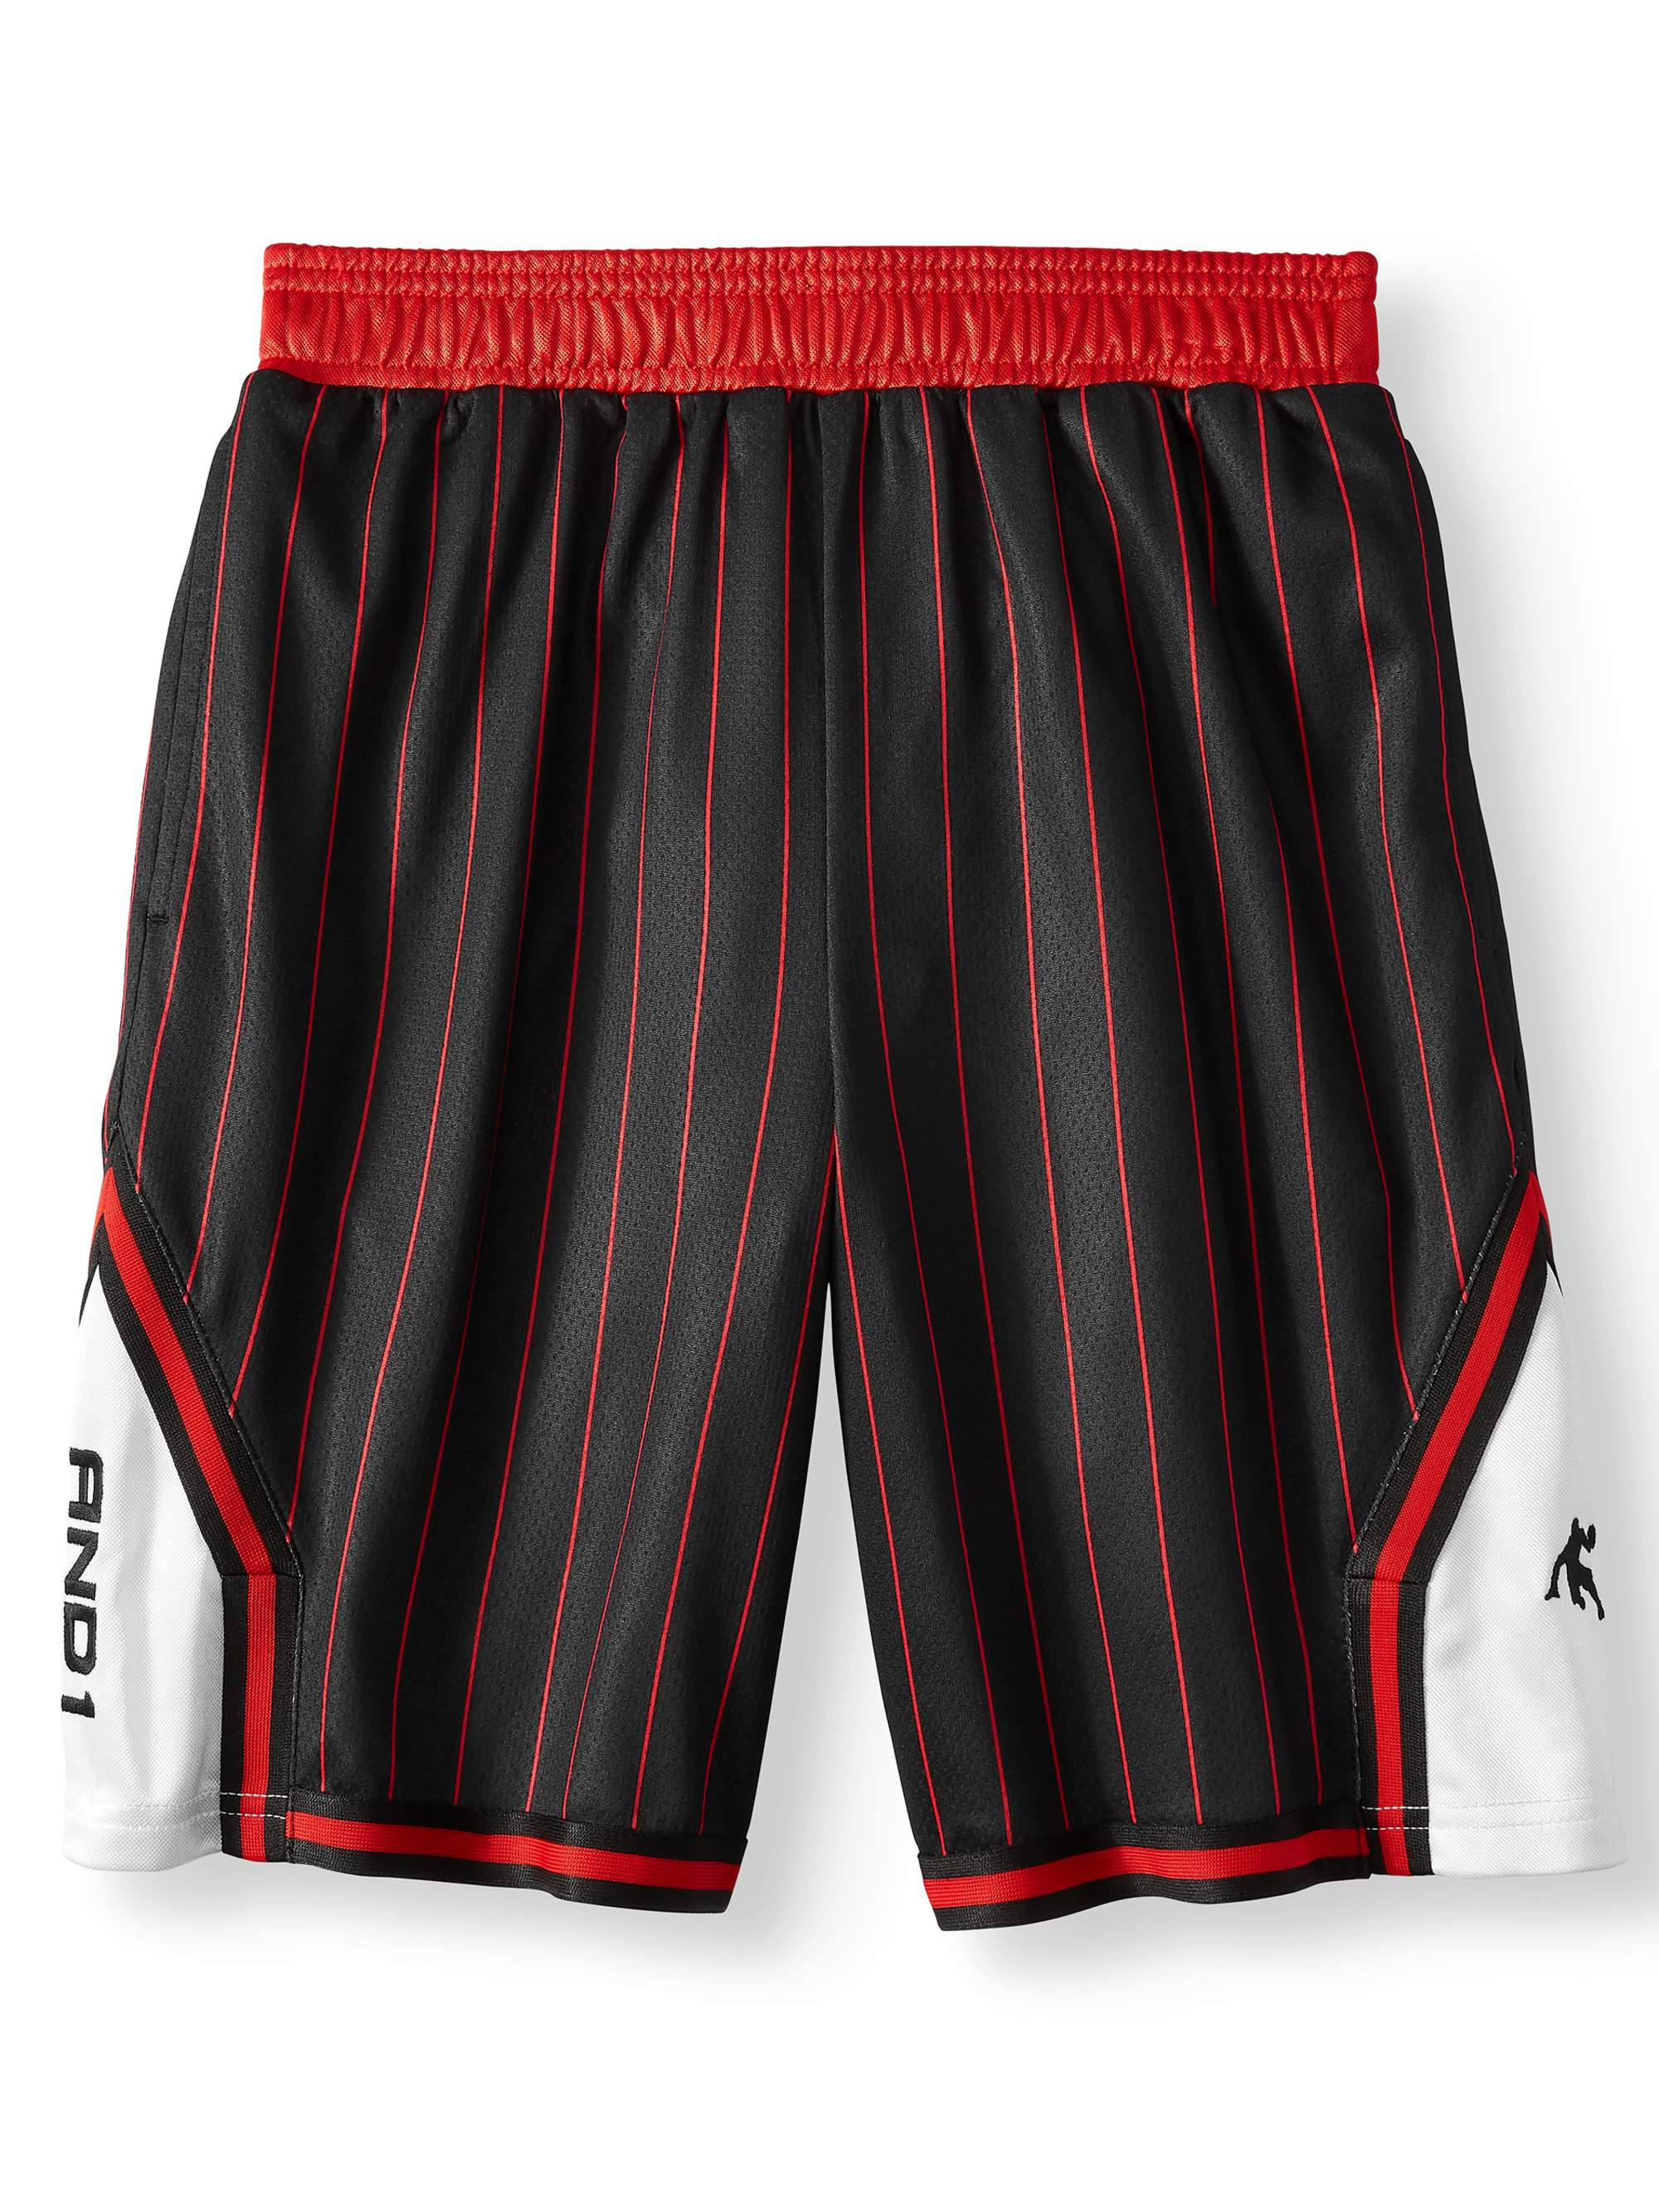 Lightweight Polyester Basketball Shorts with Pockets (Little Boys & Big Boys)